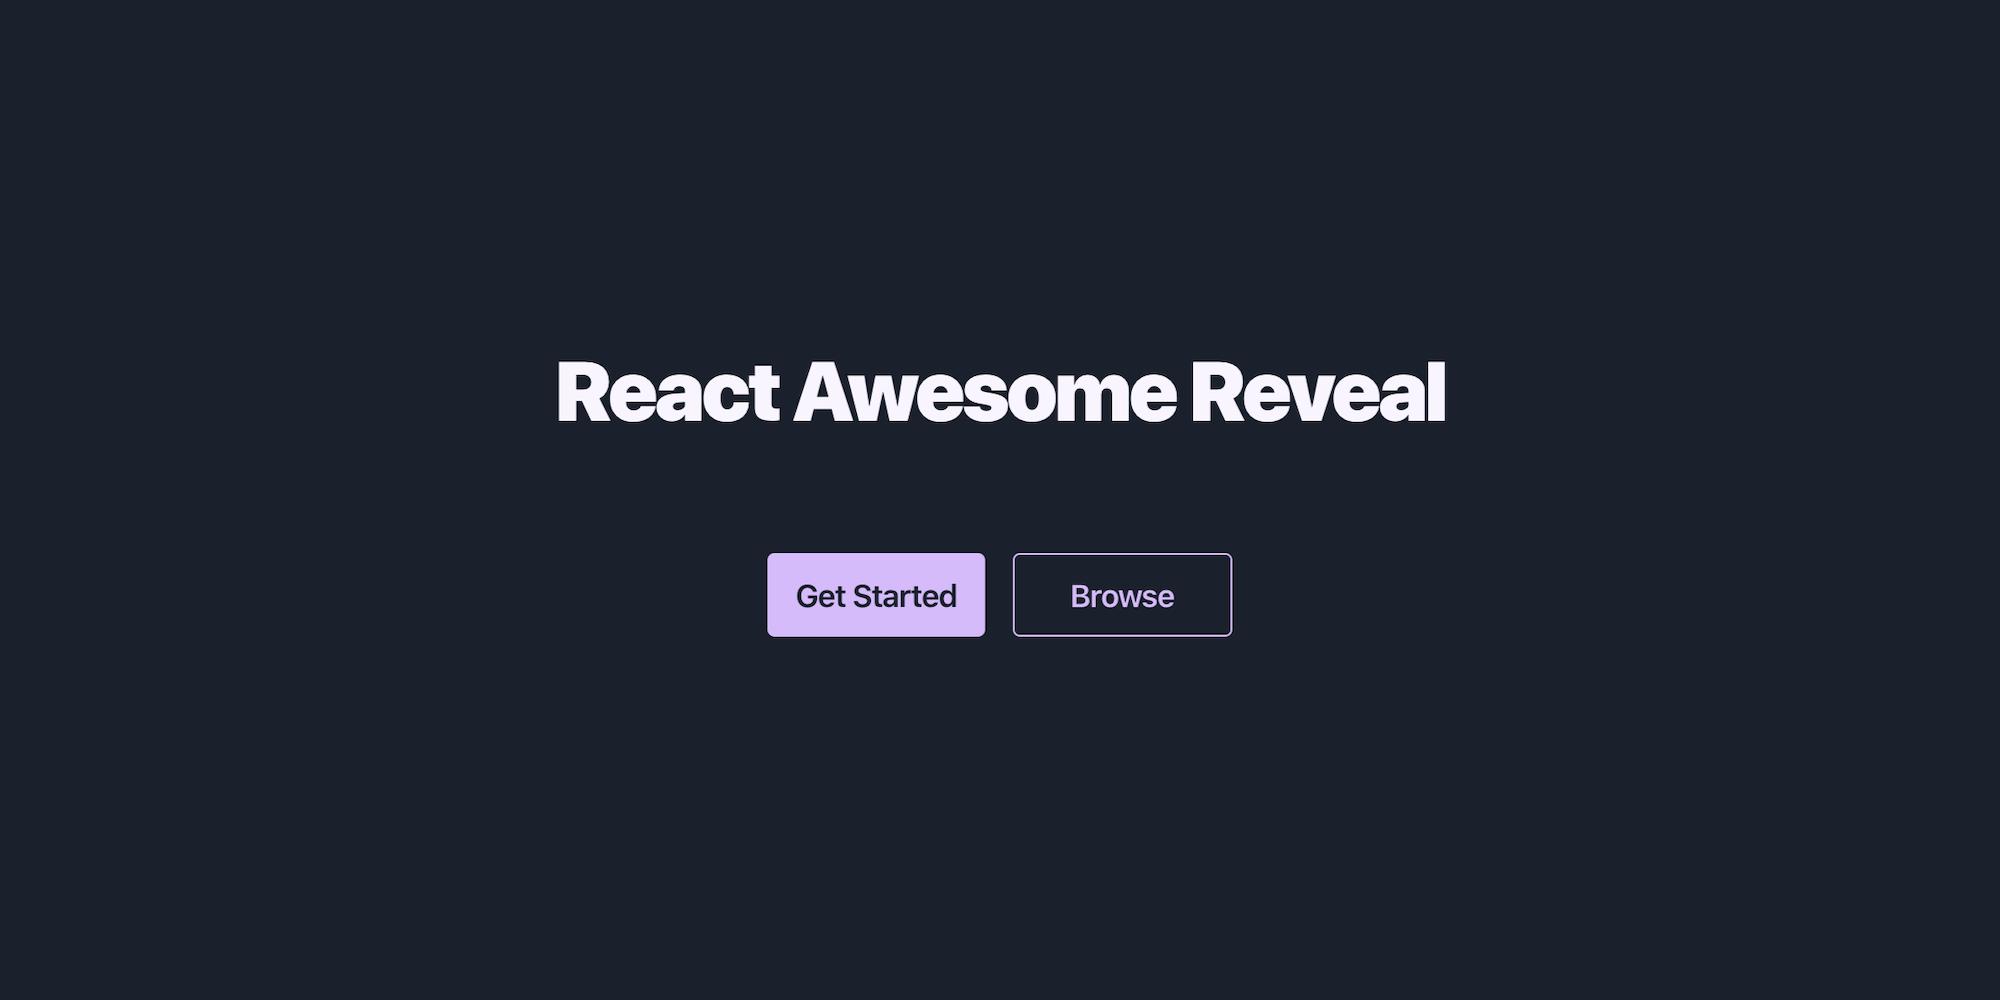 React Awesome Reveal Website Screenshot